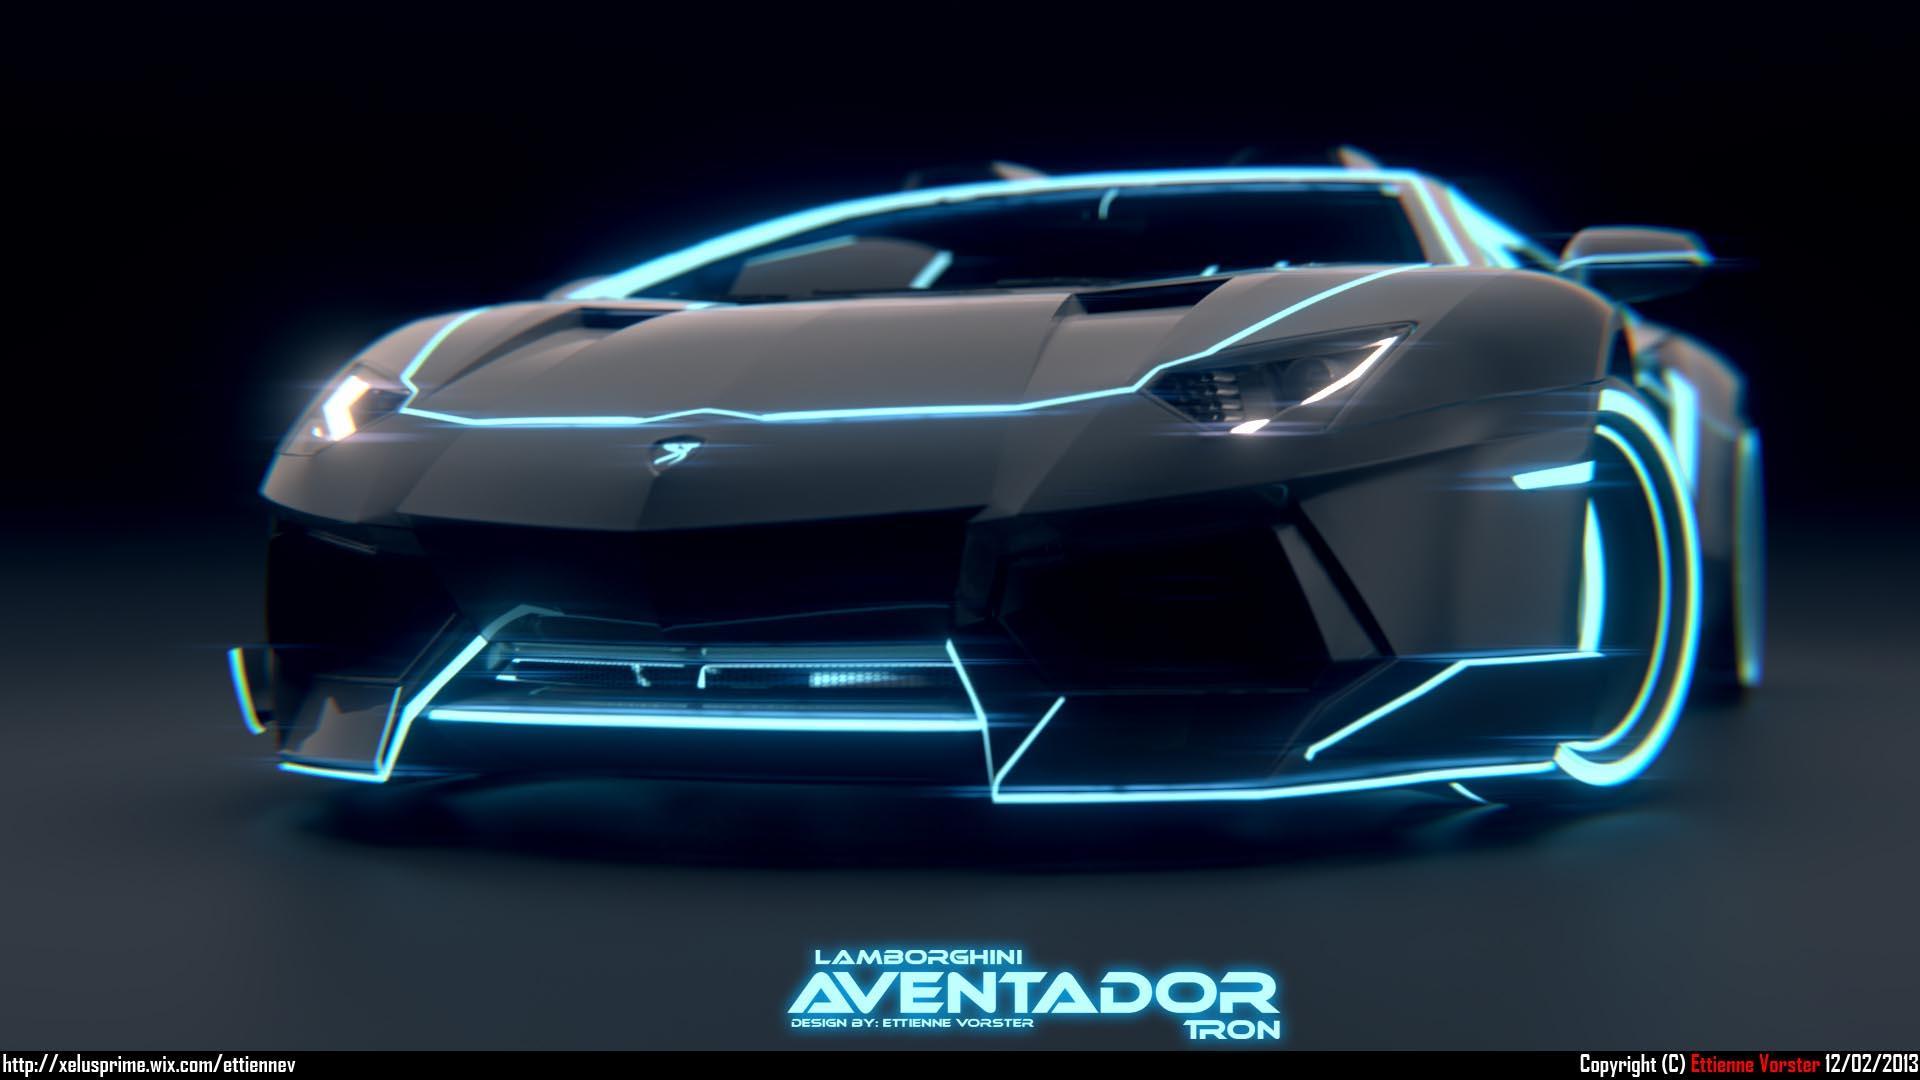 Blue Lamborghini Aventador Wallpapers Top Free Blue Lamborghini